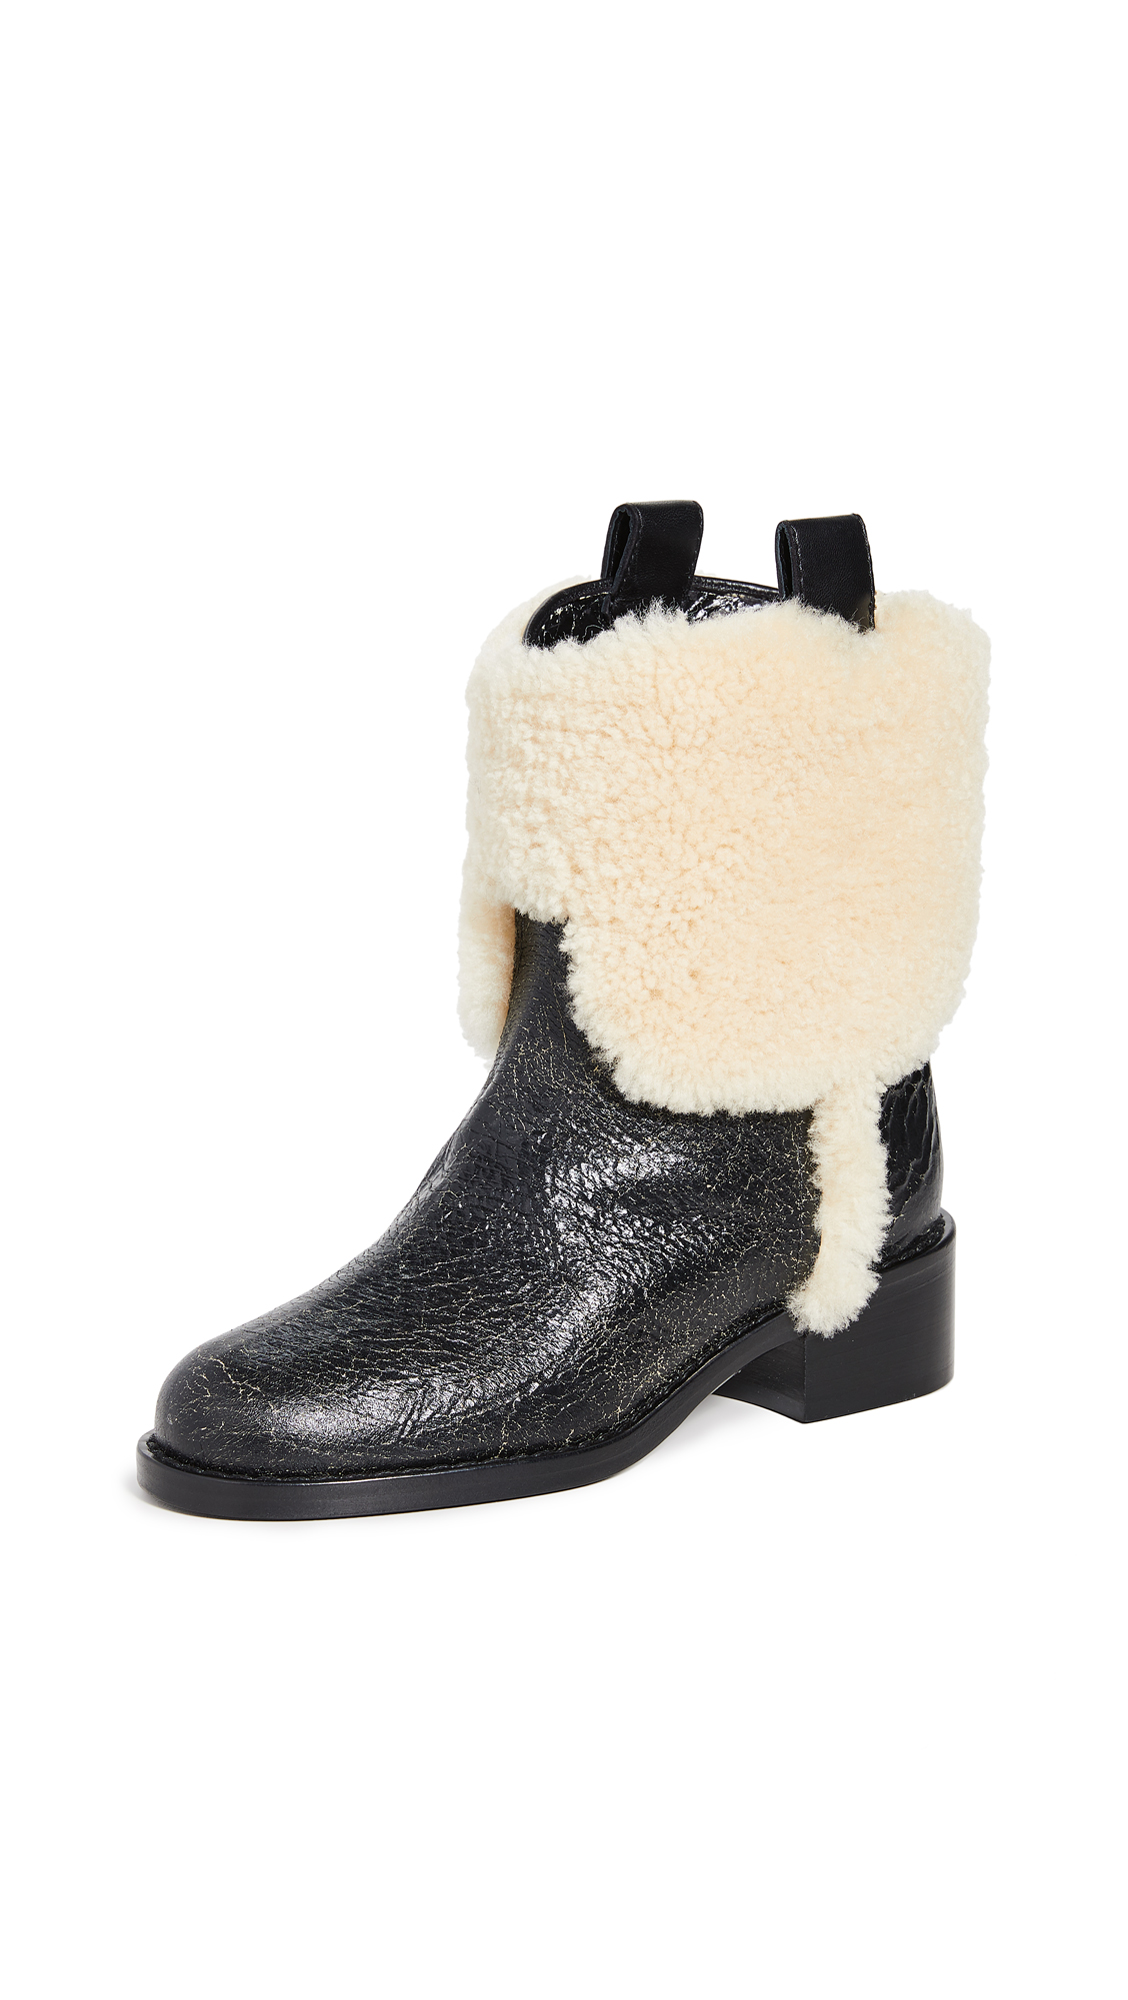 Laurence Dacade Tebaldo Boots - 70% Off Sale